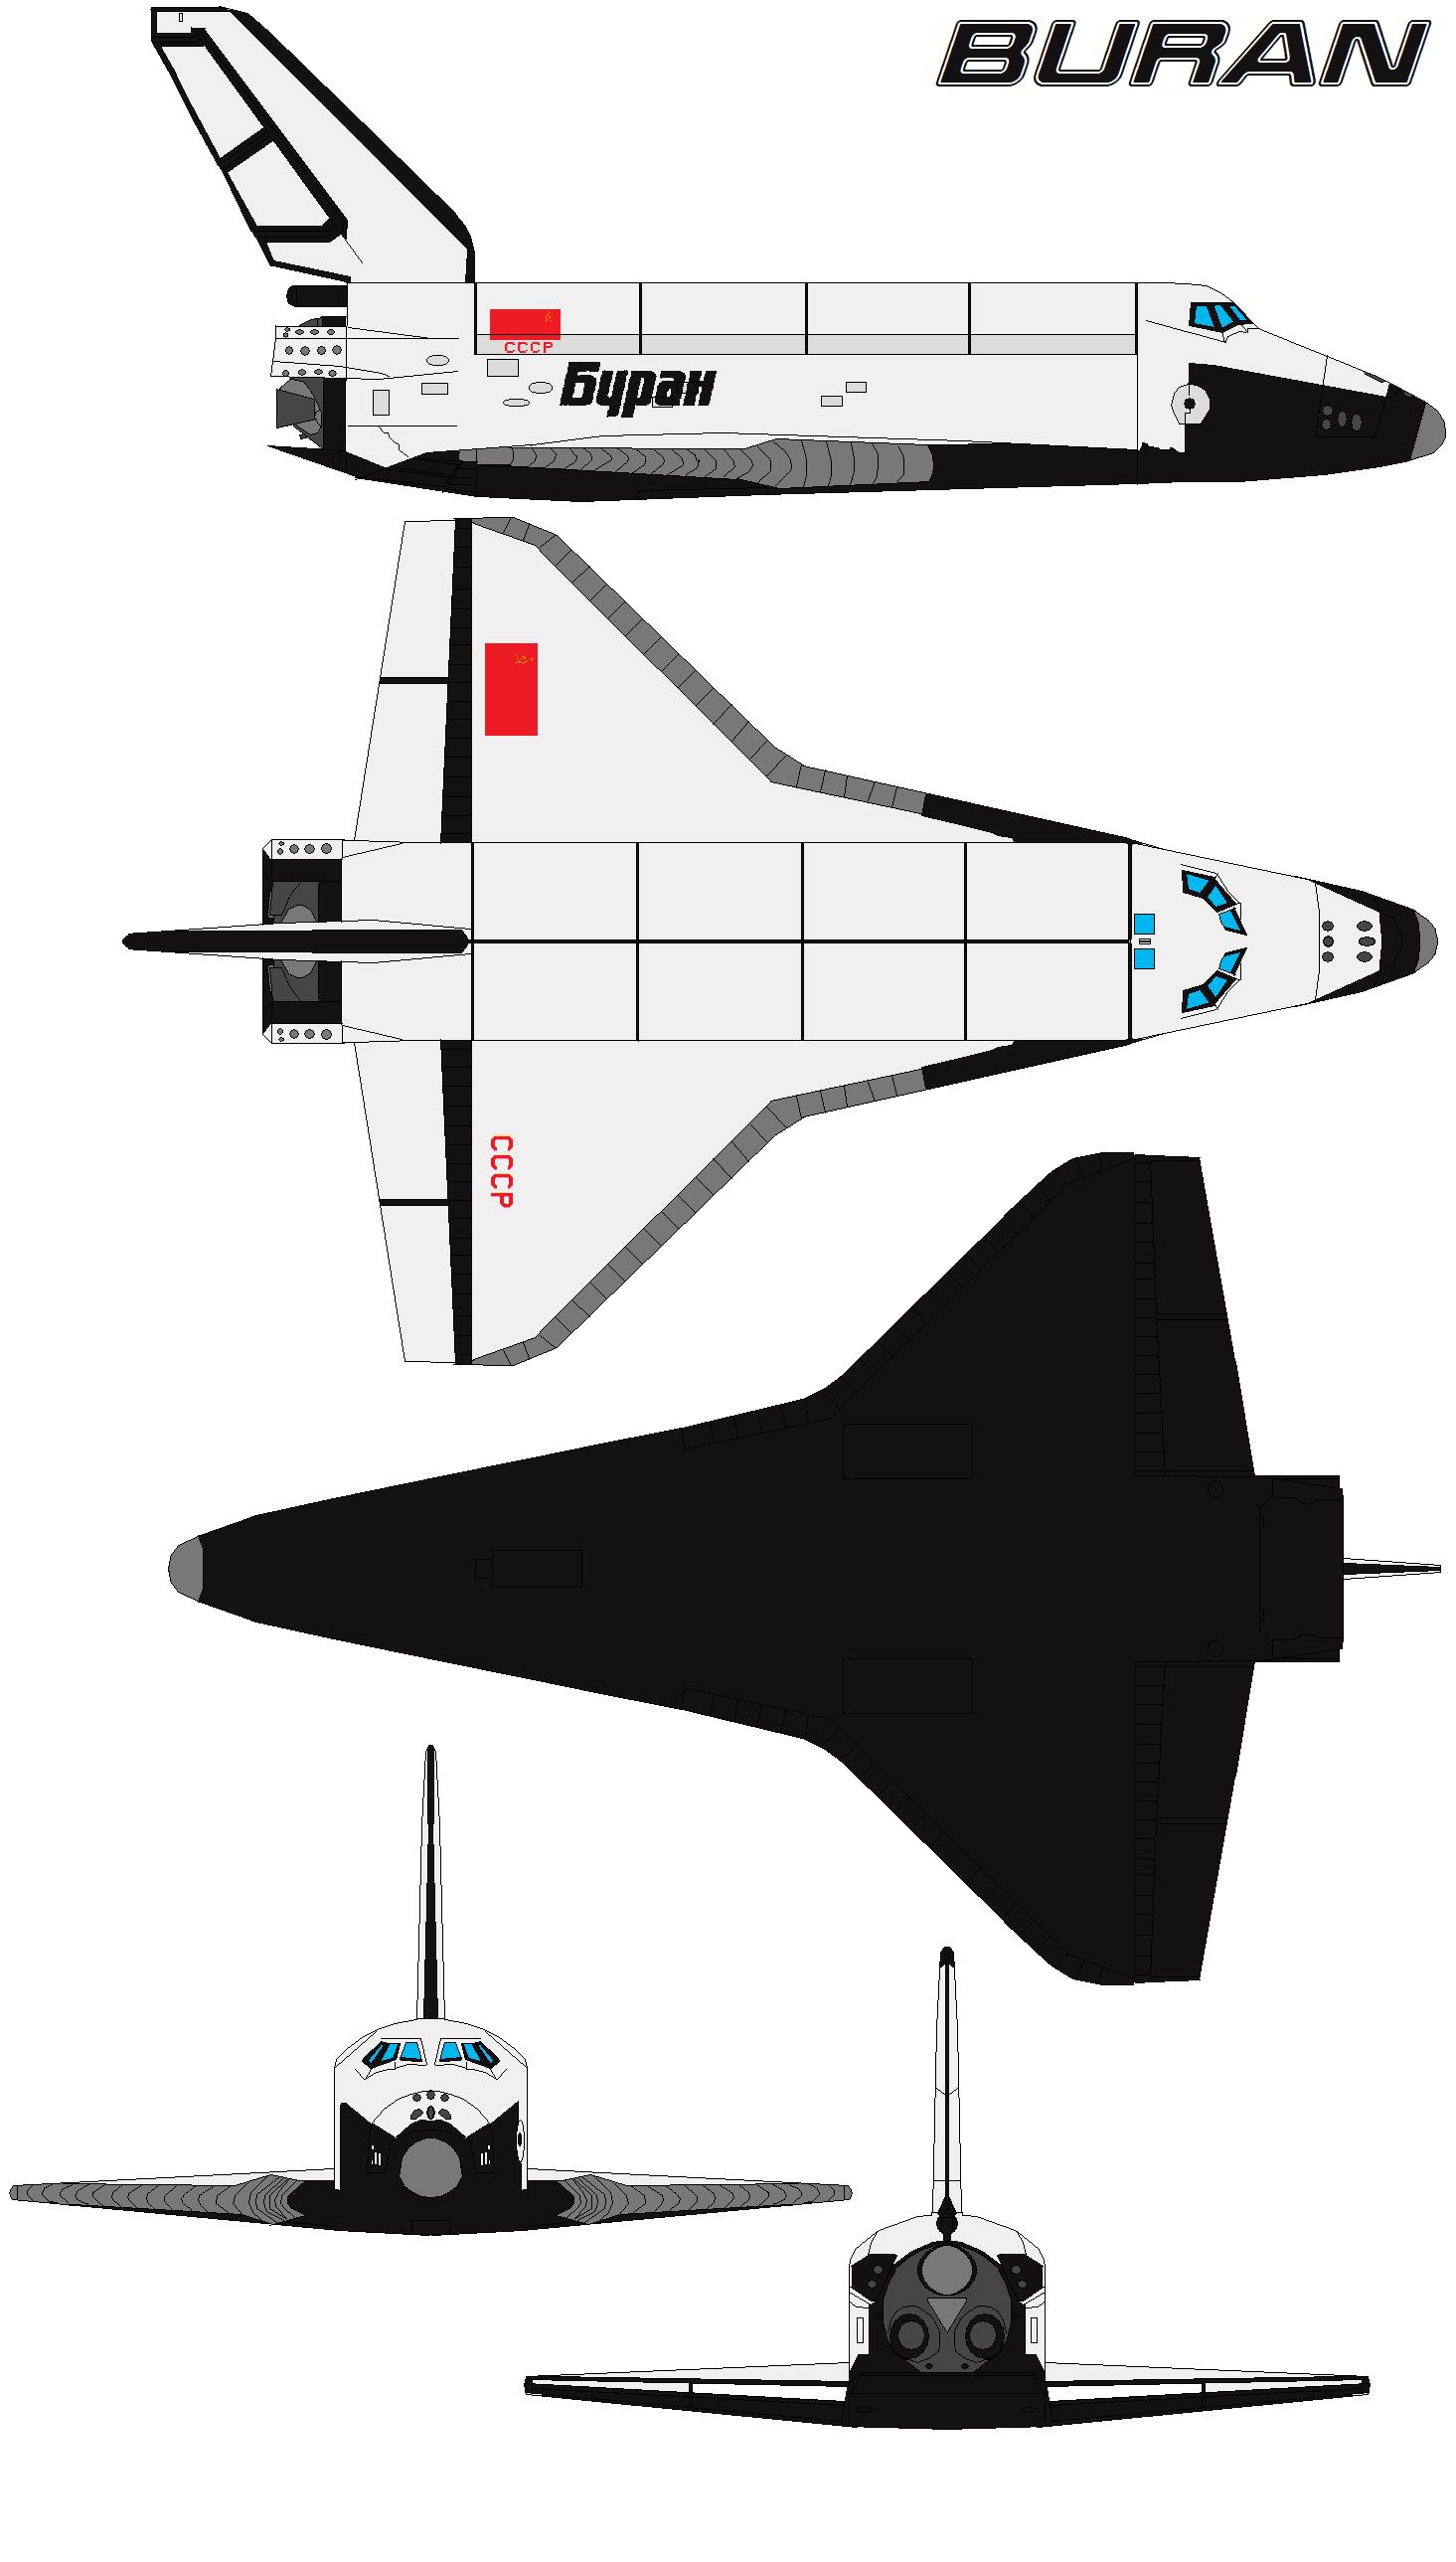 Space Shuttle Buran By Bagera Viantart On